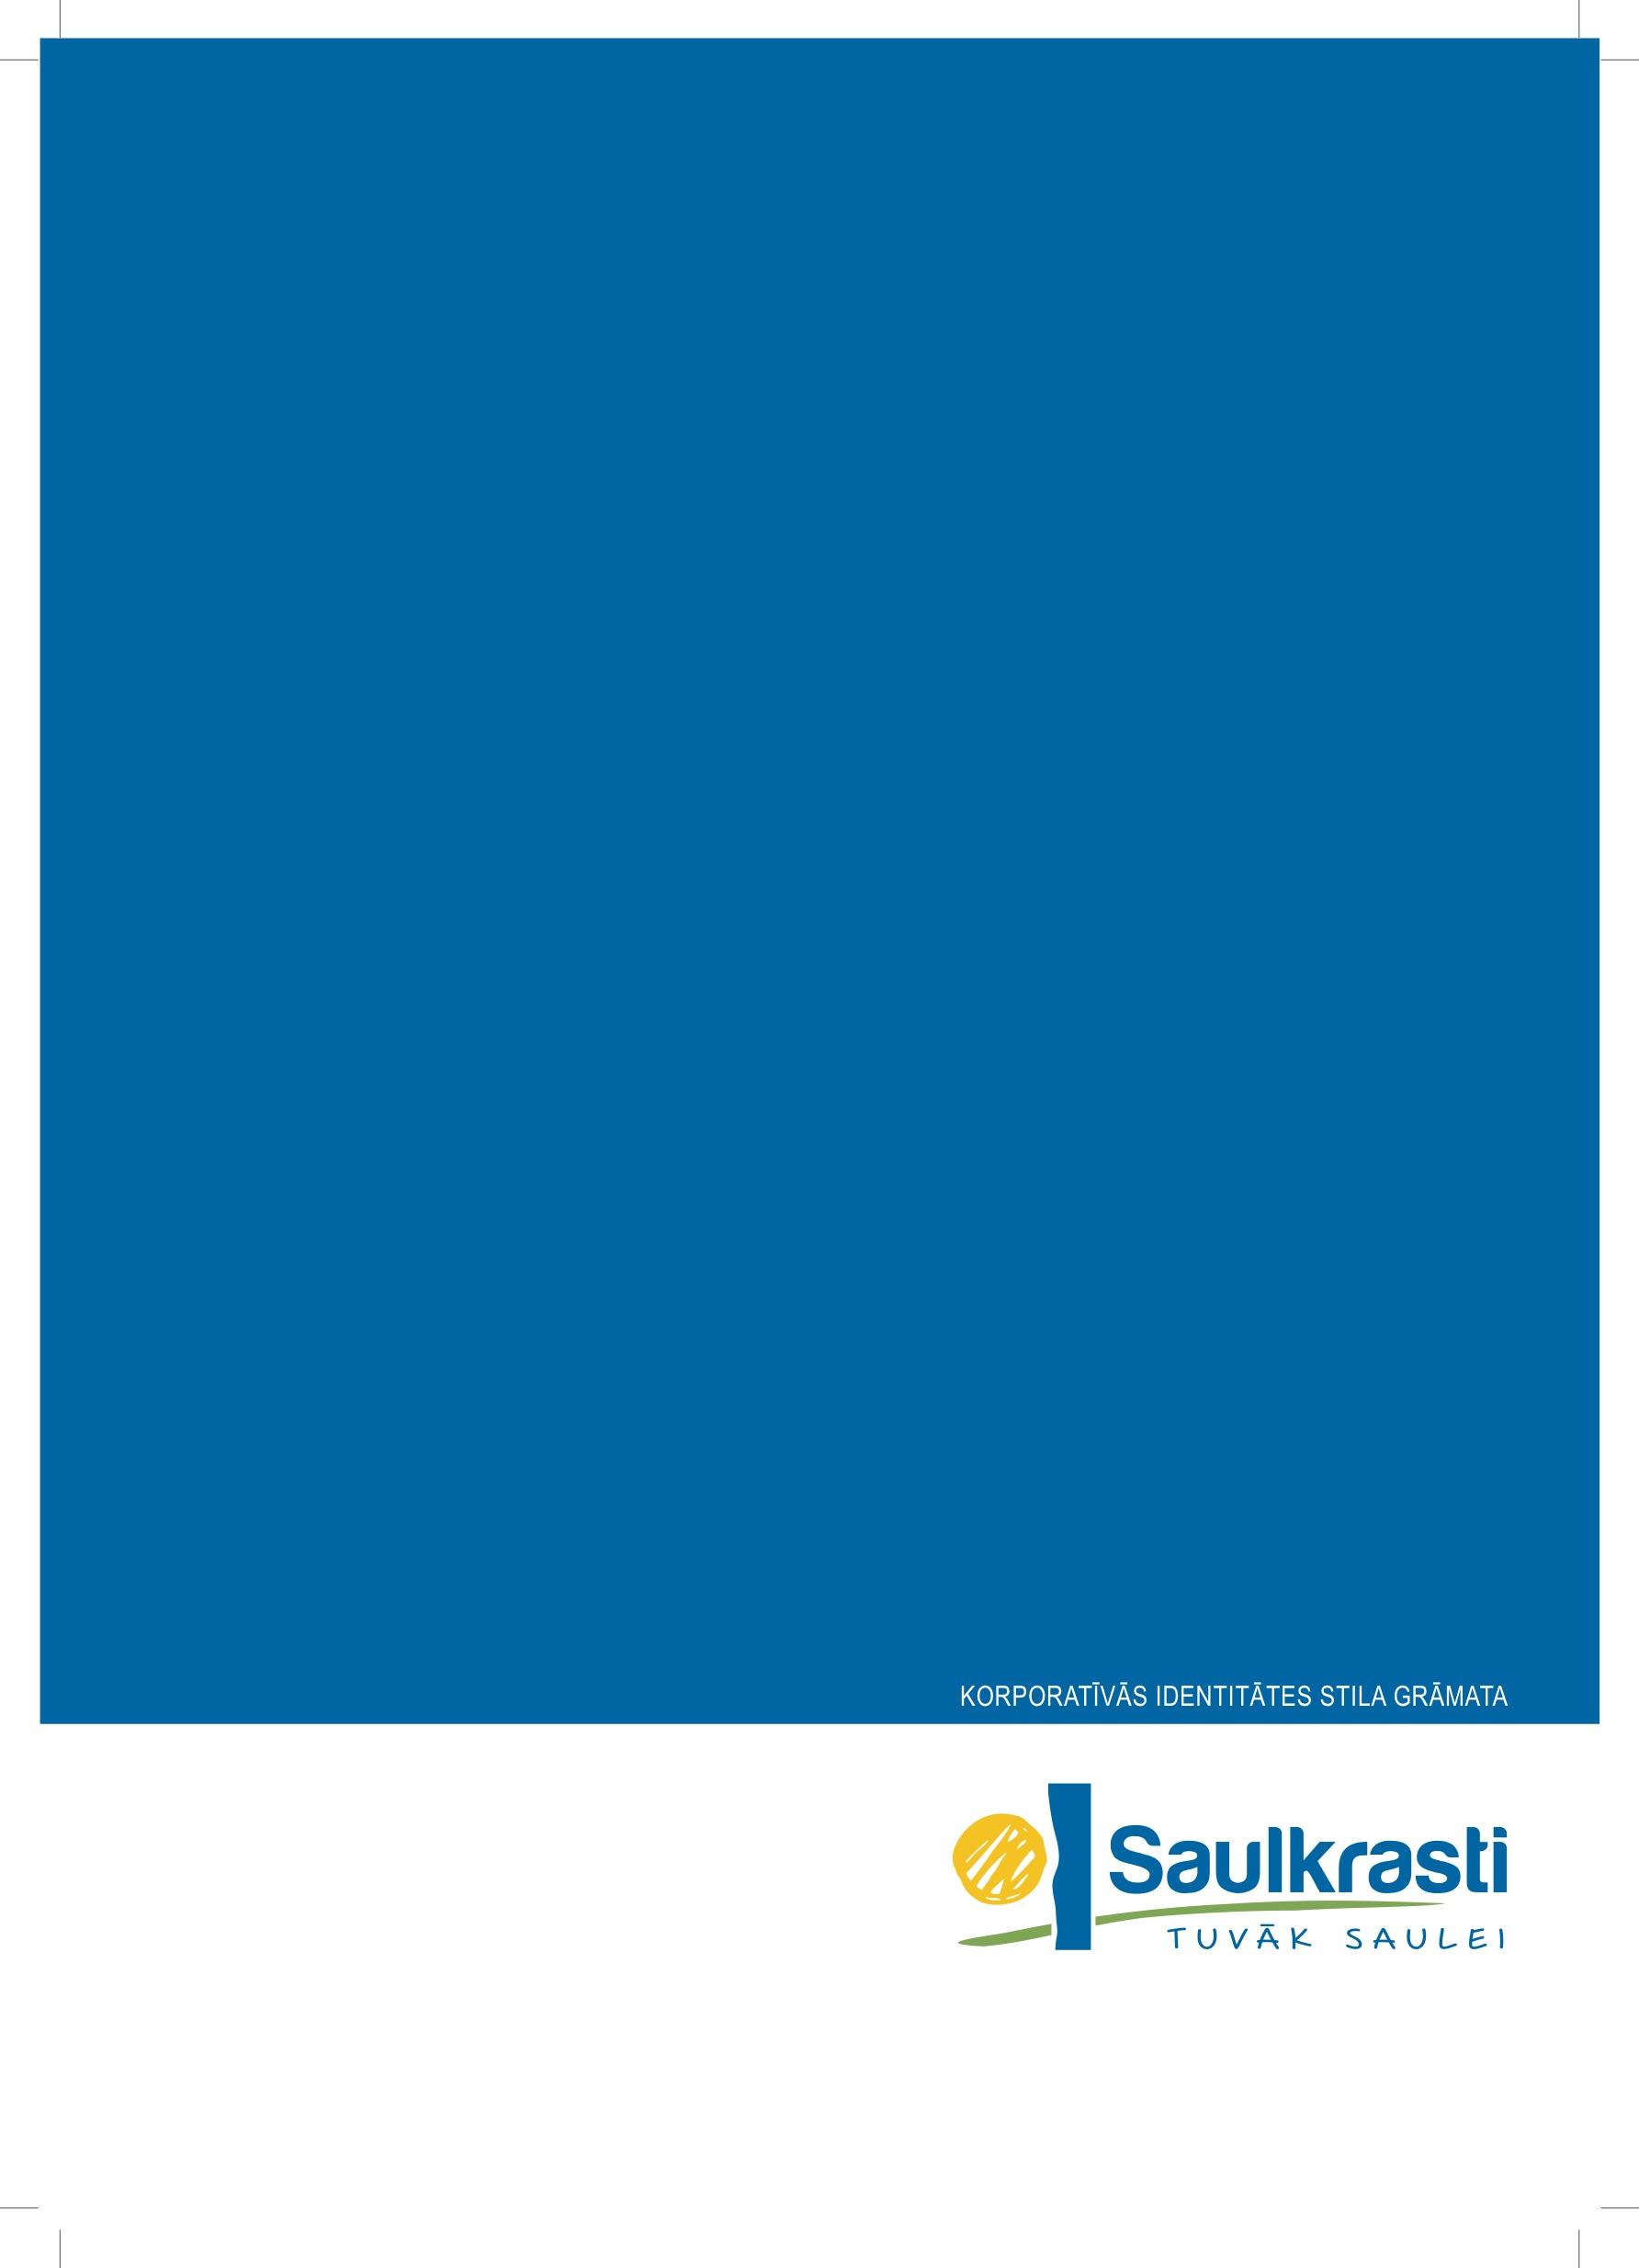 saulkrasti-print 1